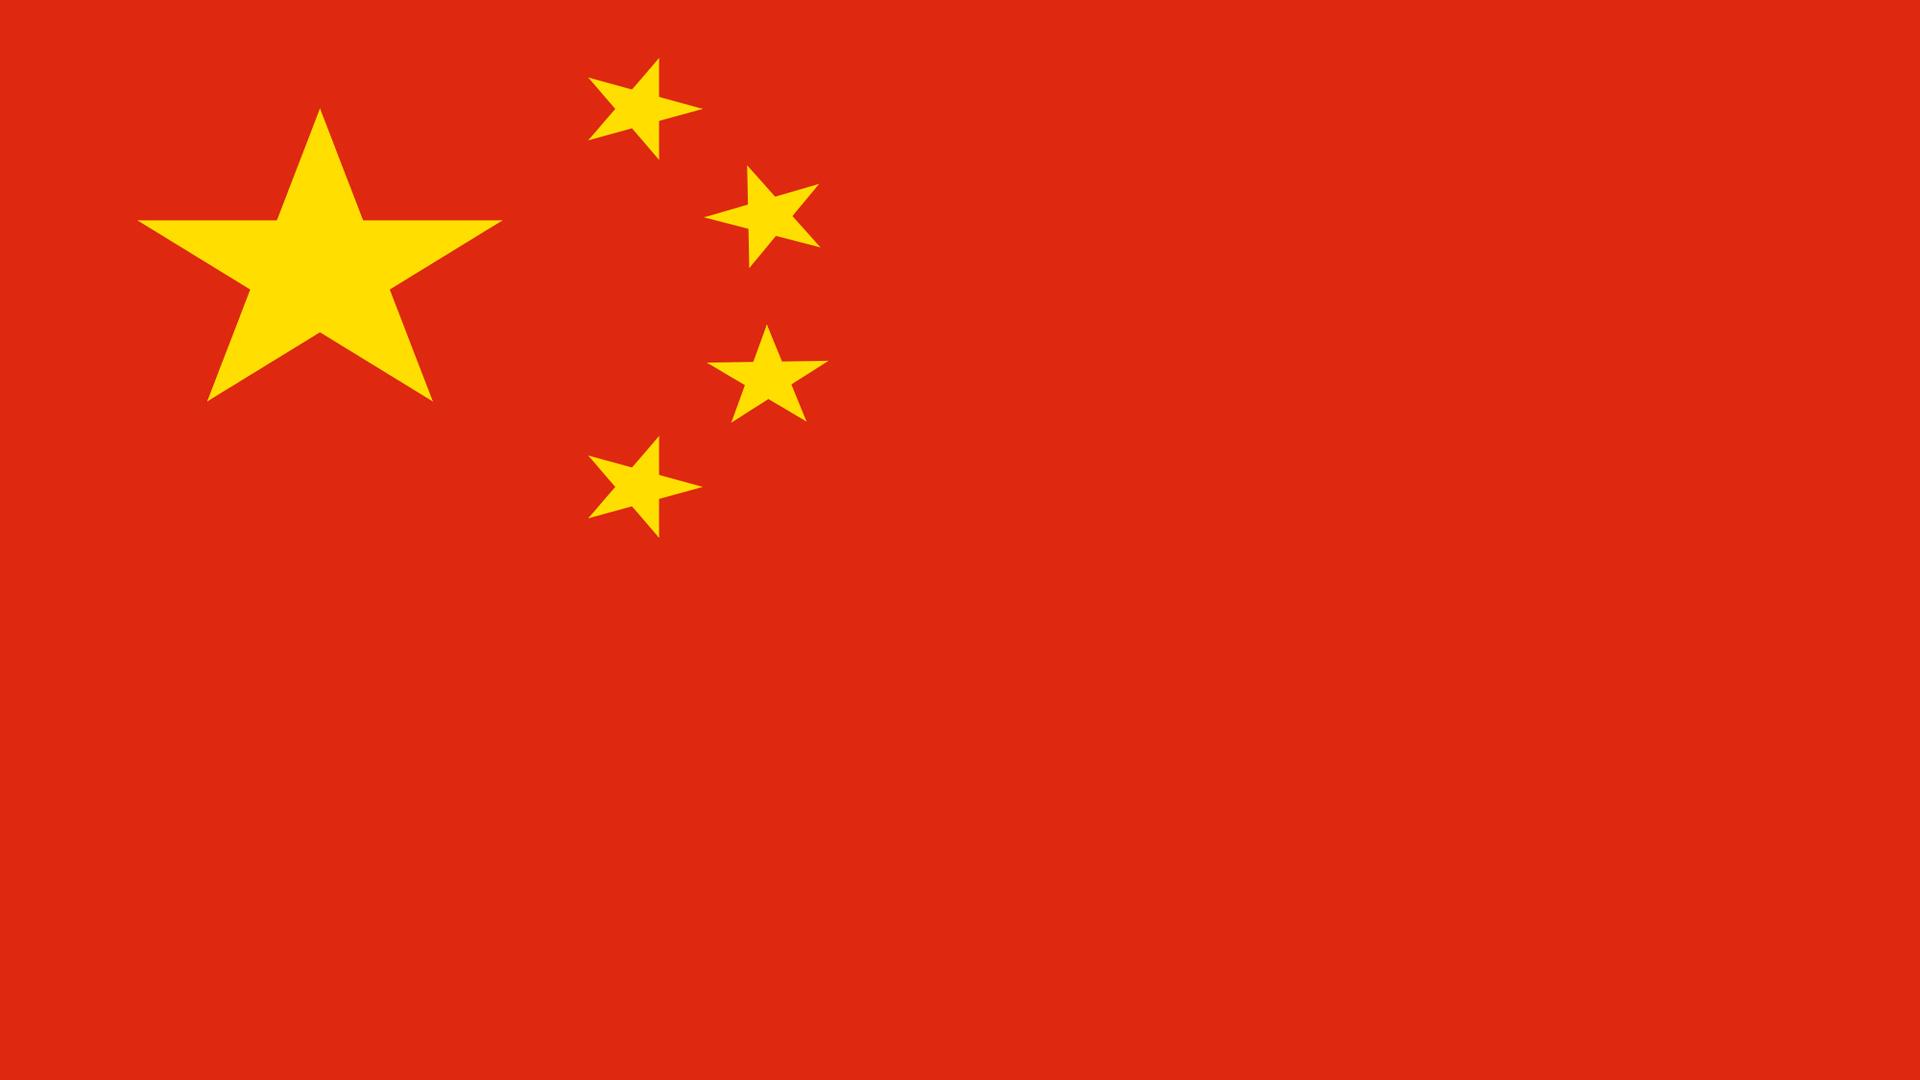 Обои Флаг Китая, картинки - Обои для ...: www.fullhdoboi.ru/photo/flags/flag_of_china/33-0-4980